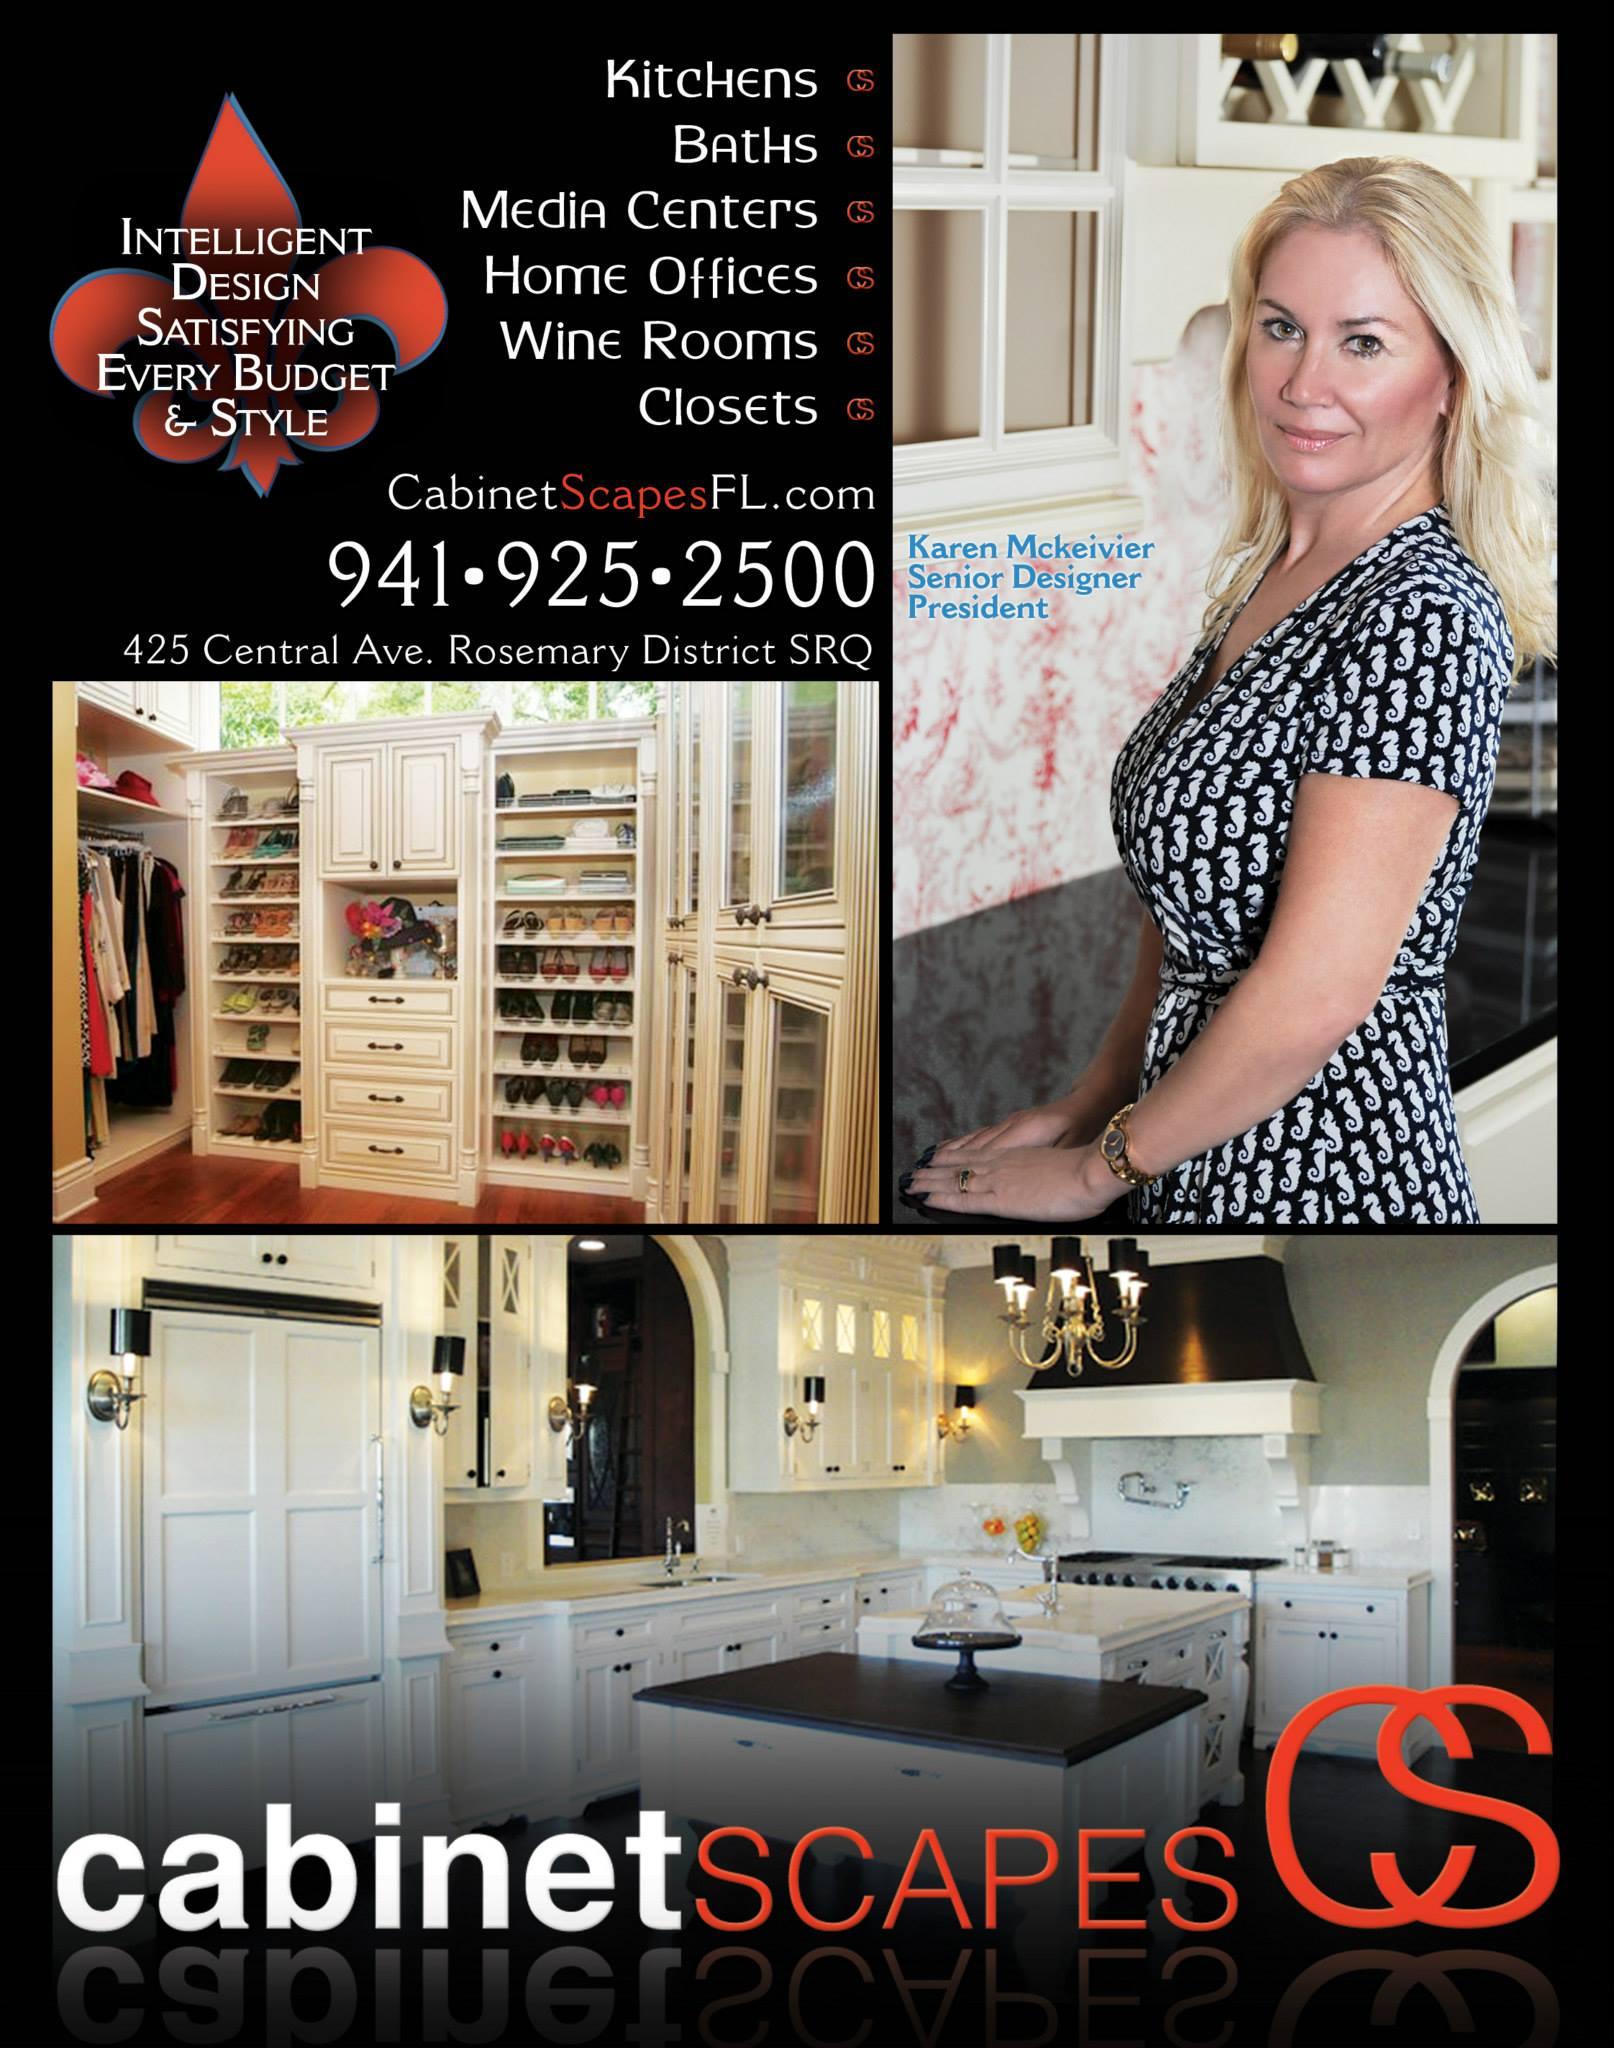 Karen Mckeivier designer Cabinet Scapes print ad by Instudio E